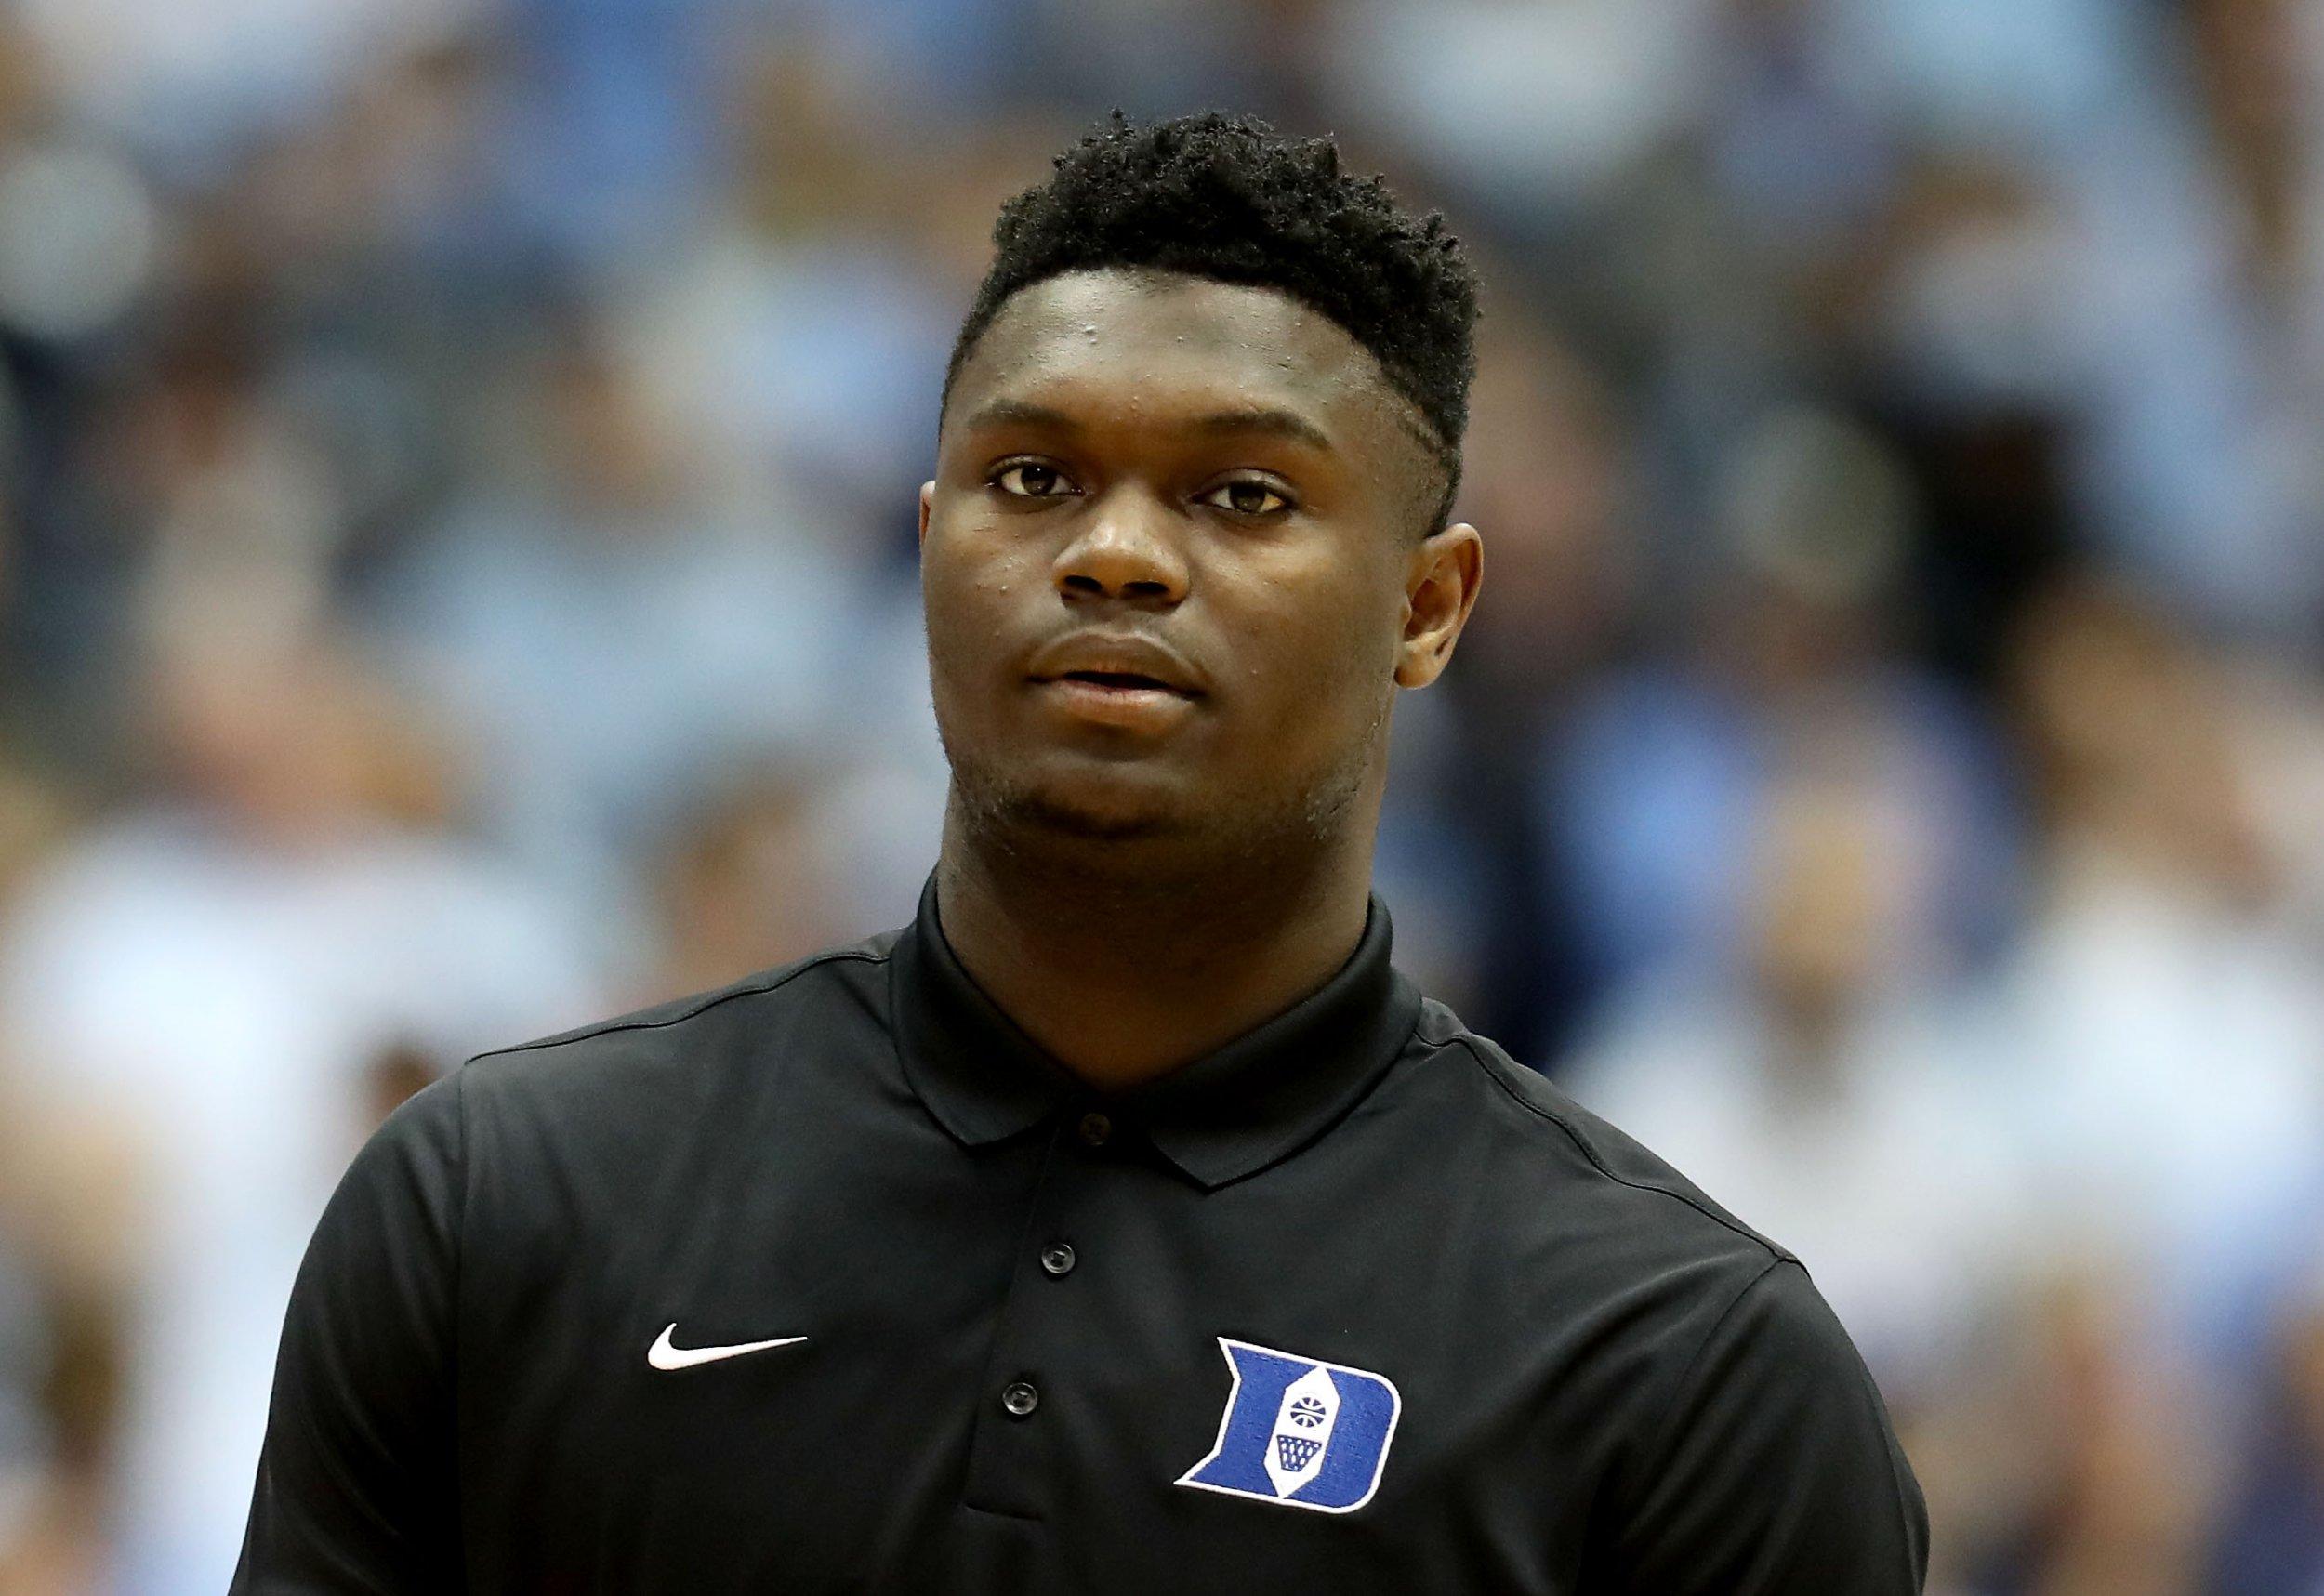 Zion Williamson, Duke Blue Devils